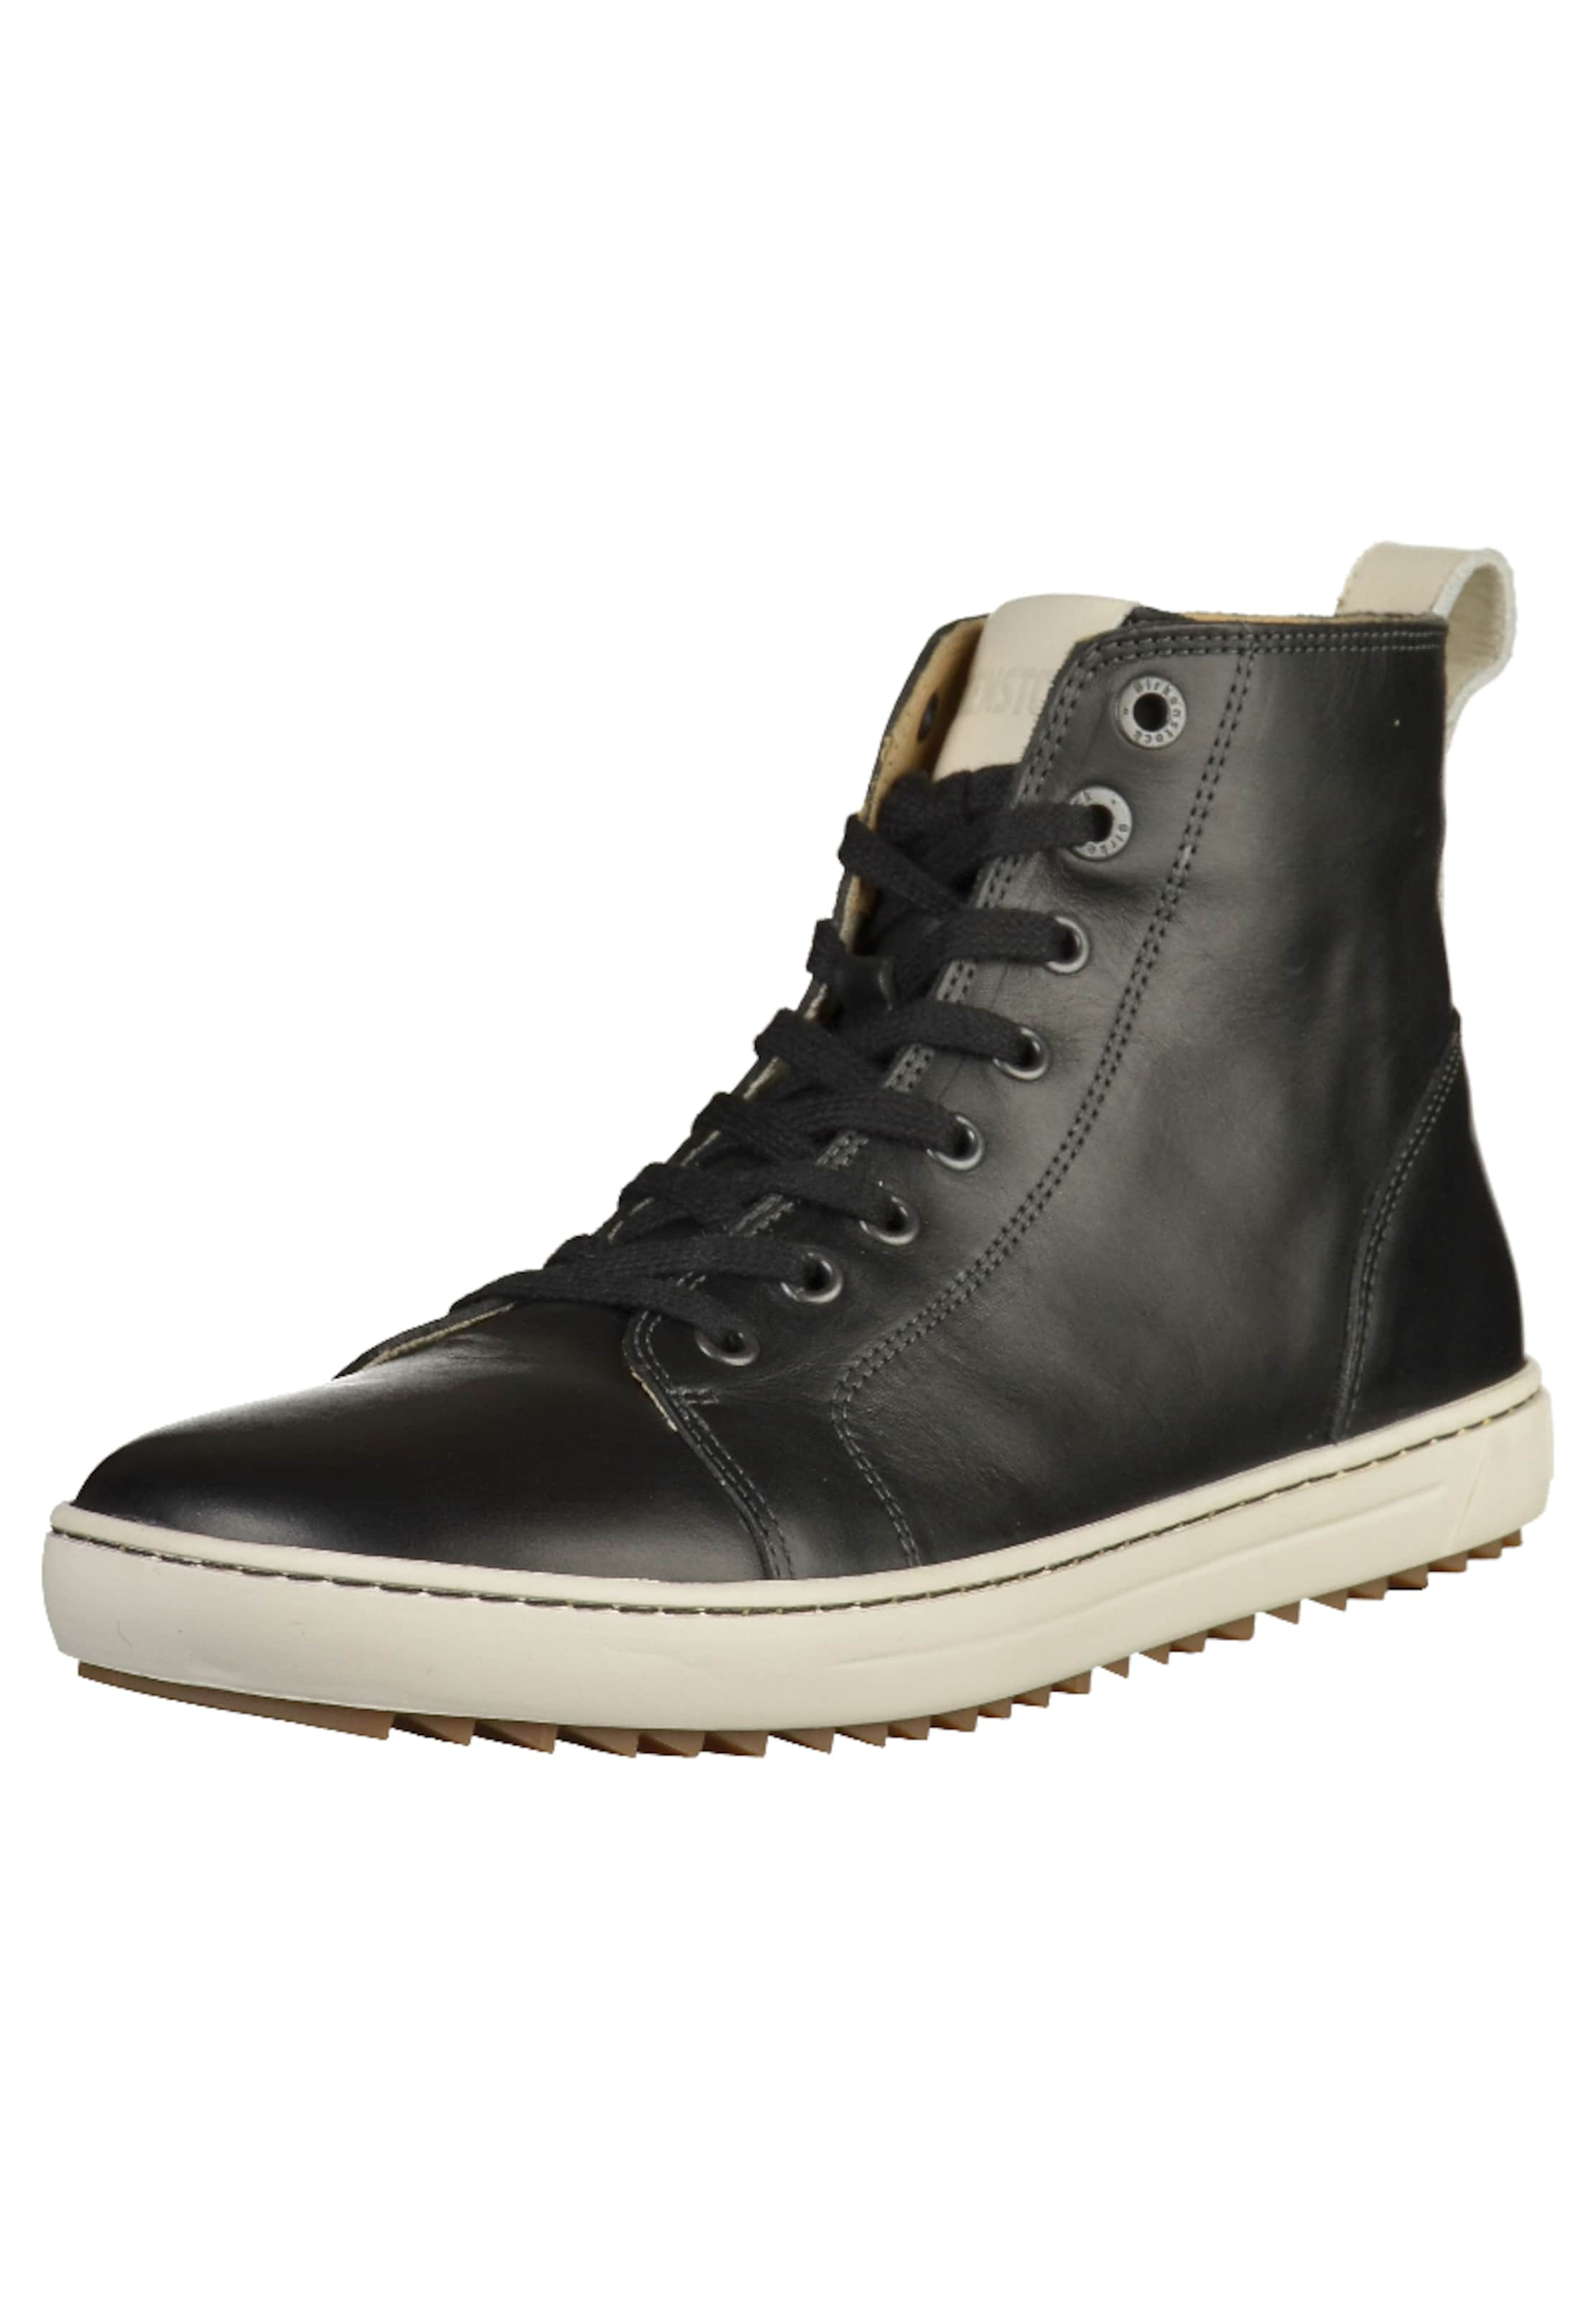 BIRKENSTOCK Sneaker 'Bartlett' Verschleißfeste billige Schuhe